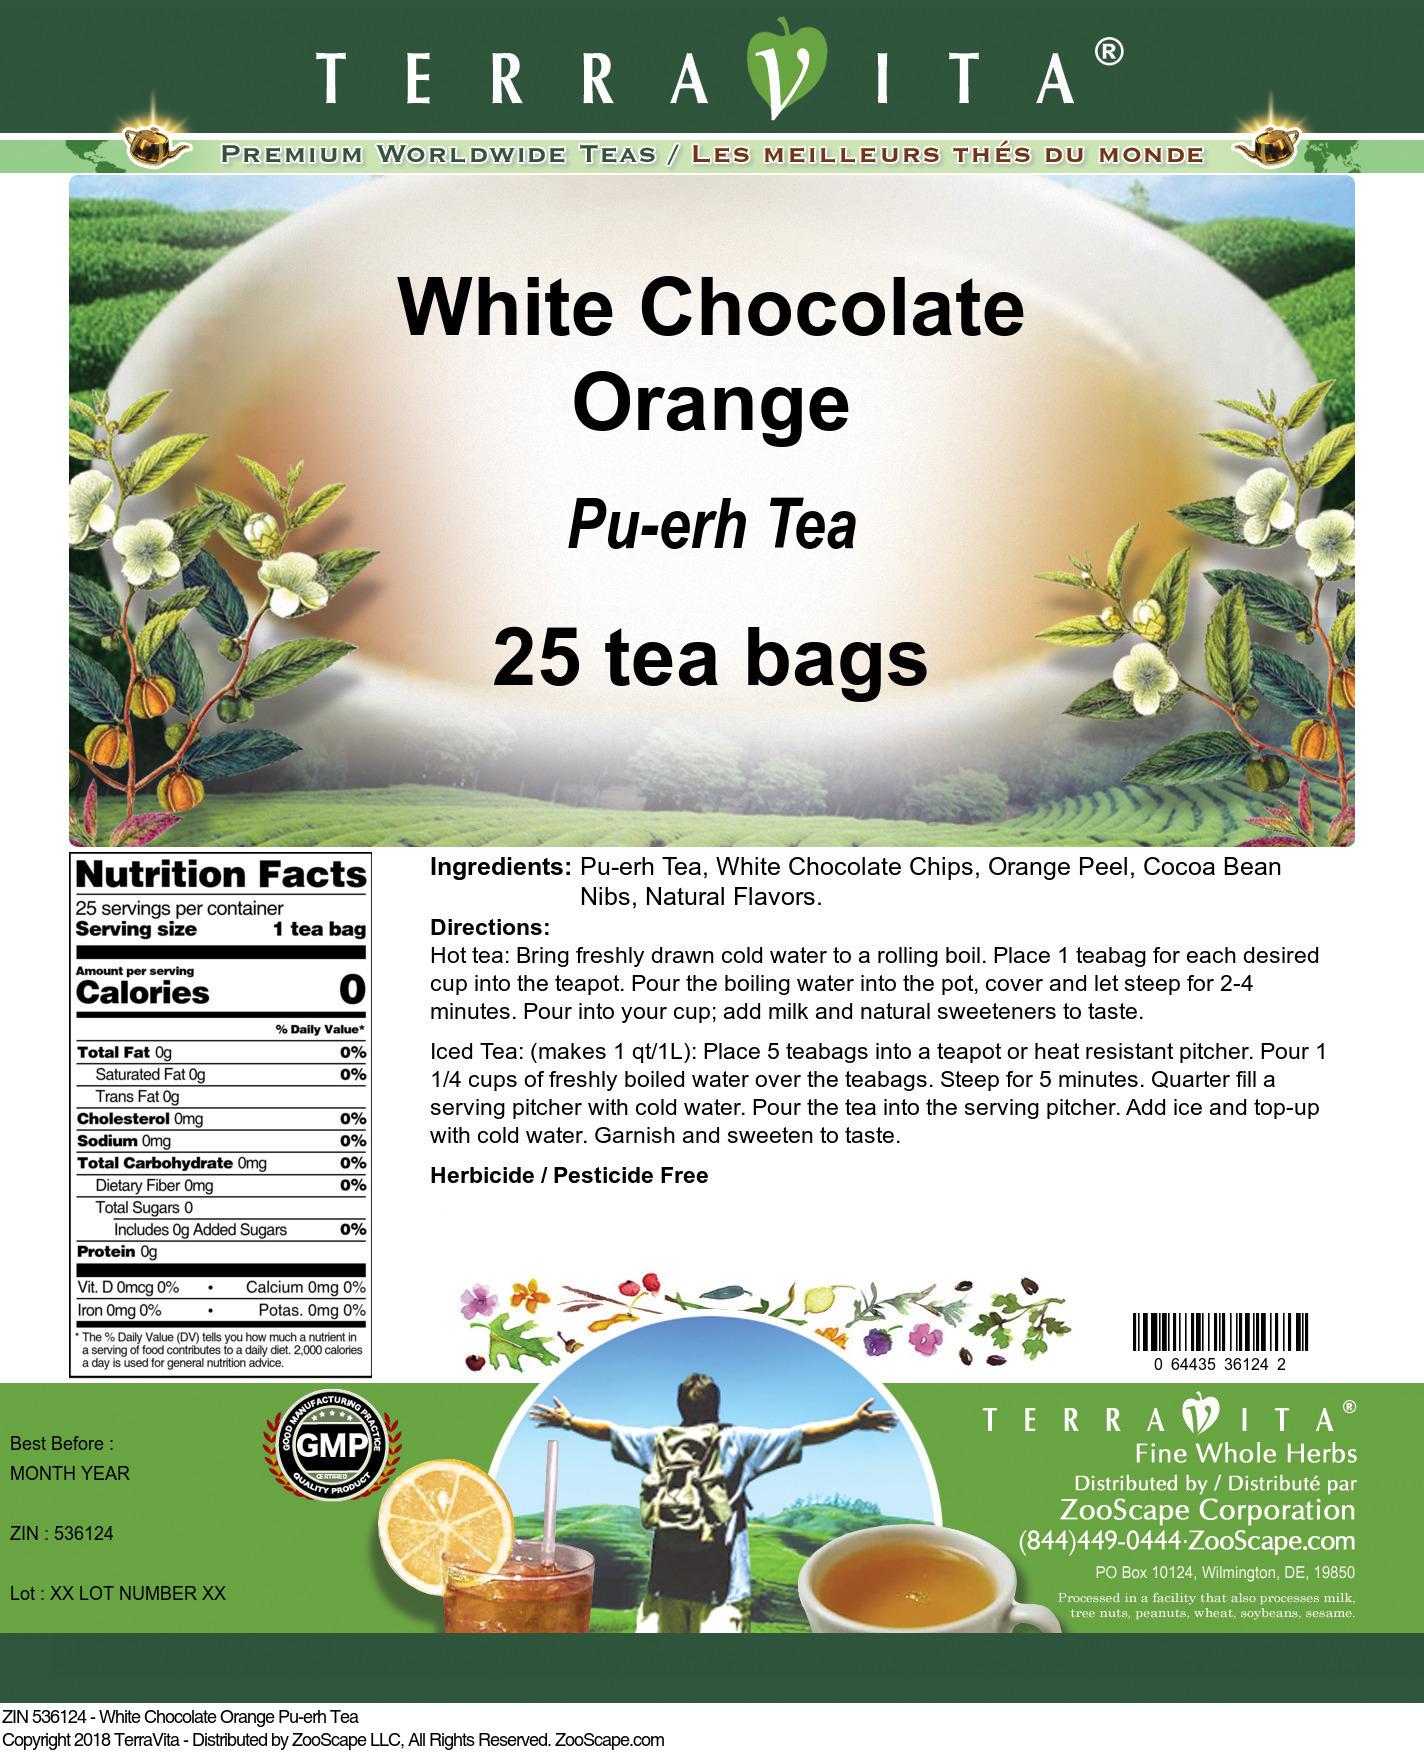 White Chocolate Orange Pu-erh Tea